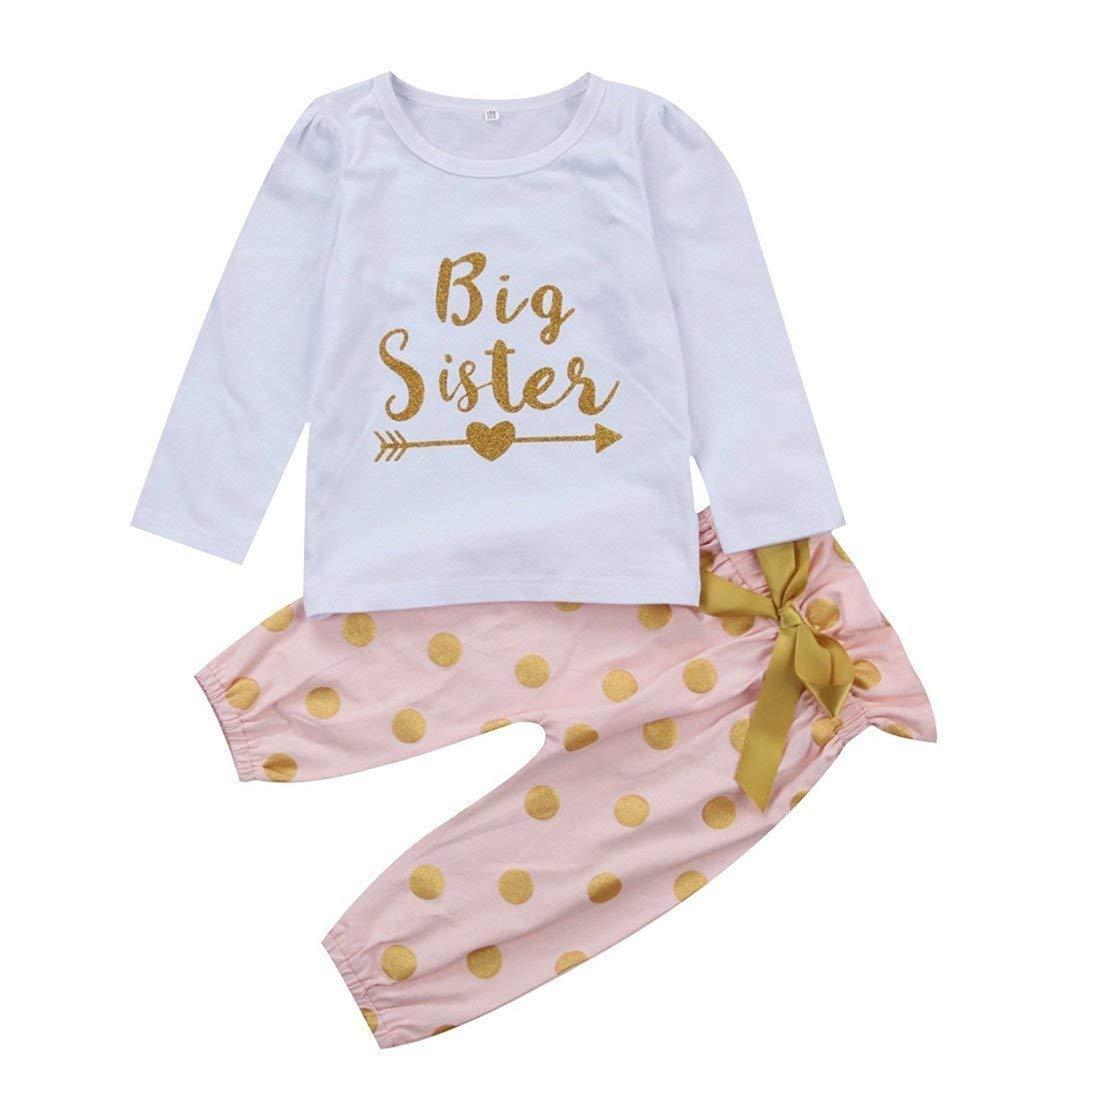 b566f36953b57 Amazon.com: Little Sister Big Sister Matching Onesie Newborn Outfits ...